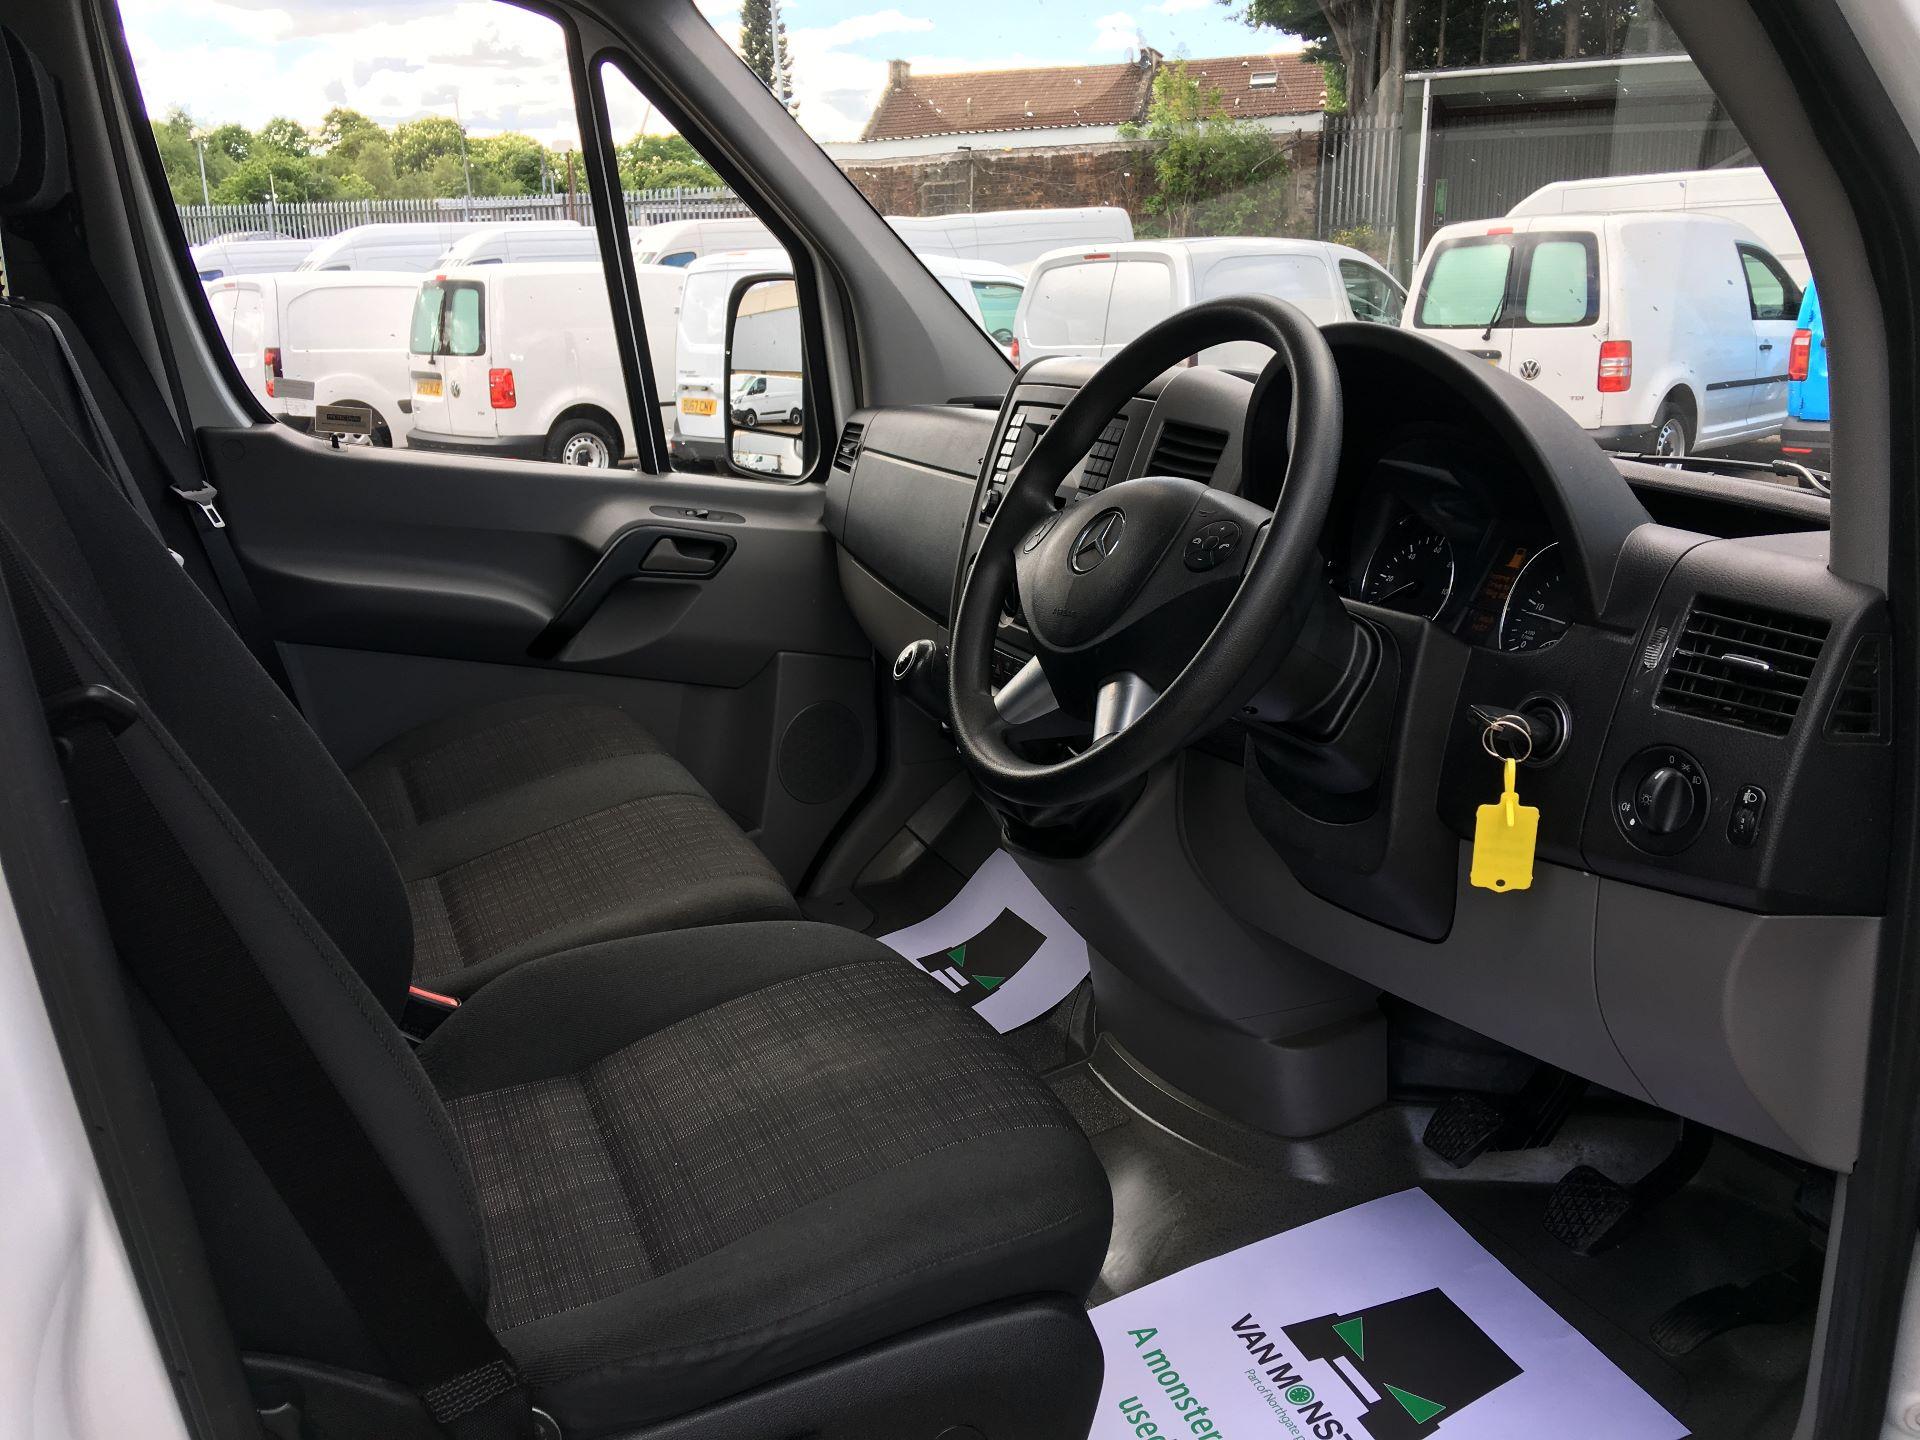 2017 Mercedes-Benz Sprinter 314 CDI LWB HIGH ROOF VAN EURO 6 (LM67FXS) Image 2